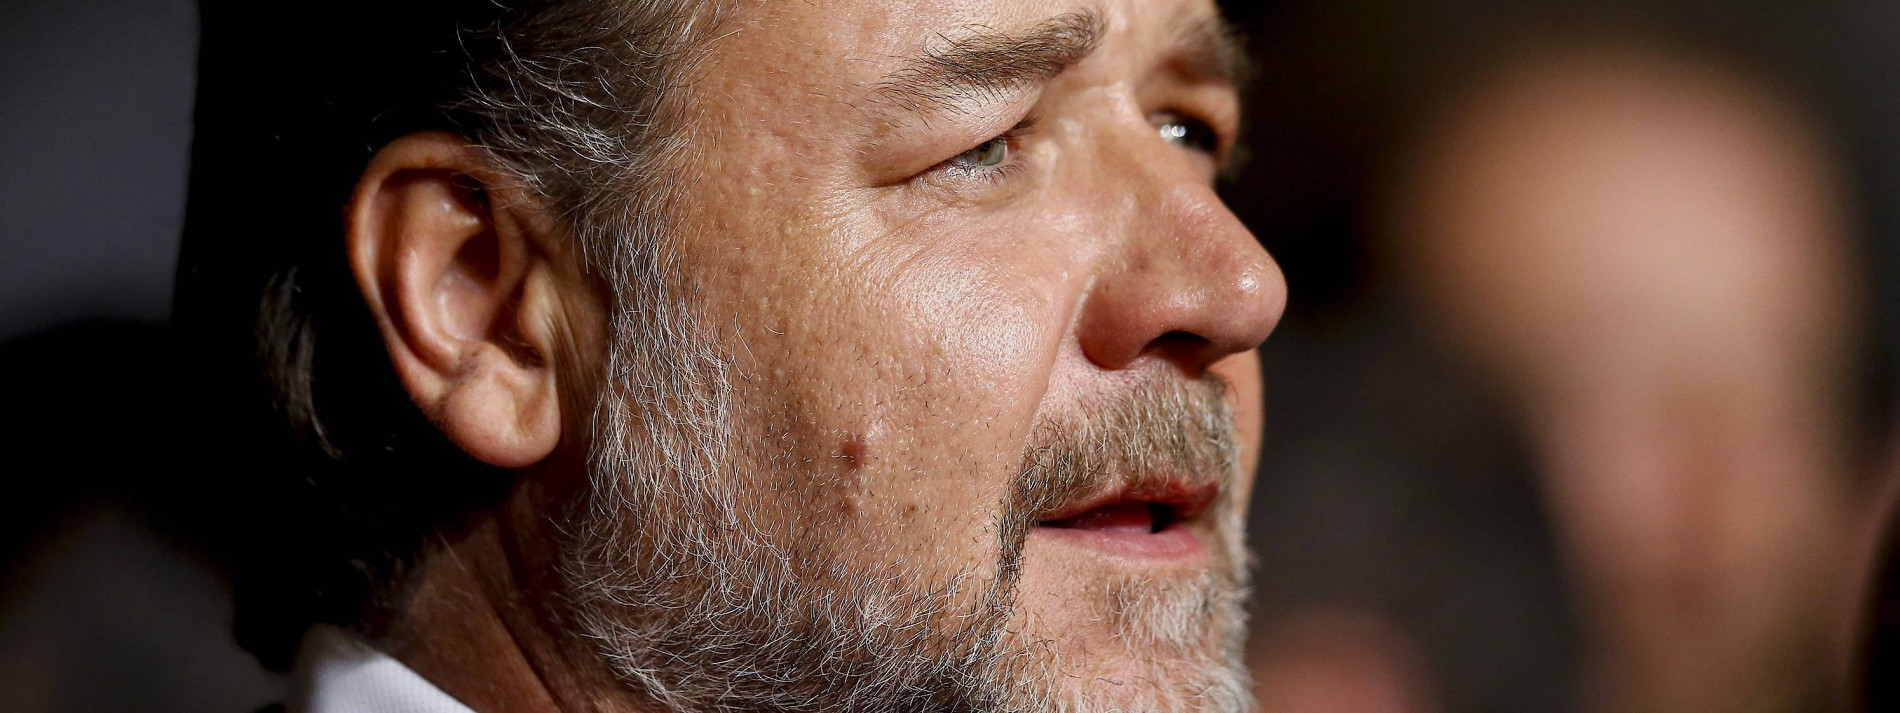 Russell Crowe hat bei Feuer Glück gehabt